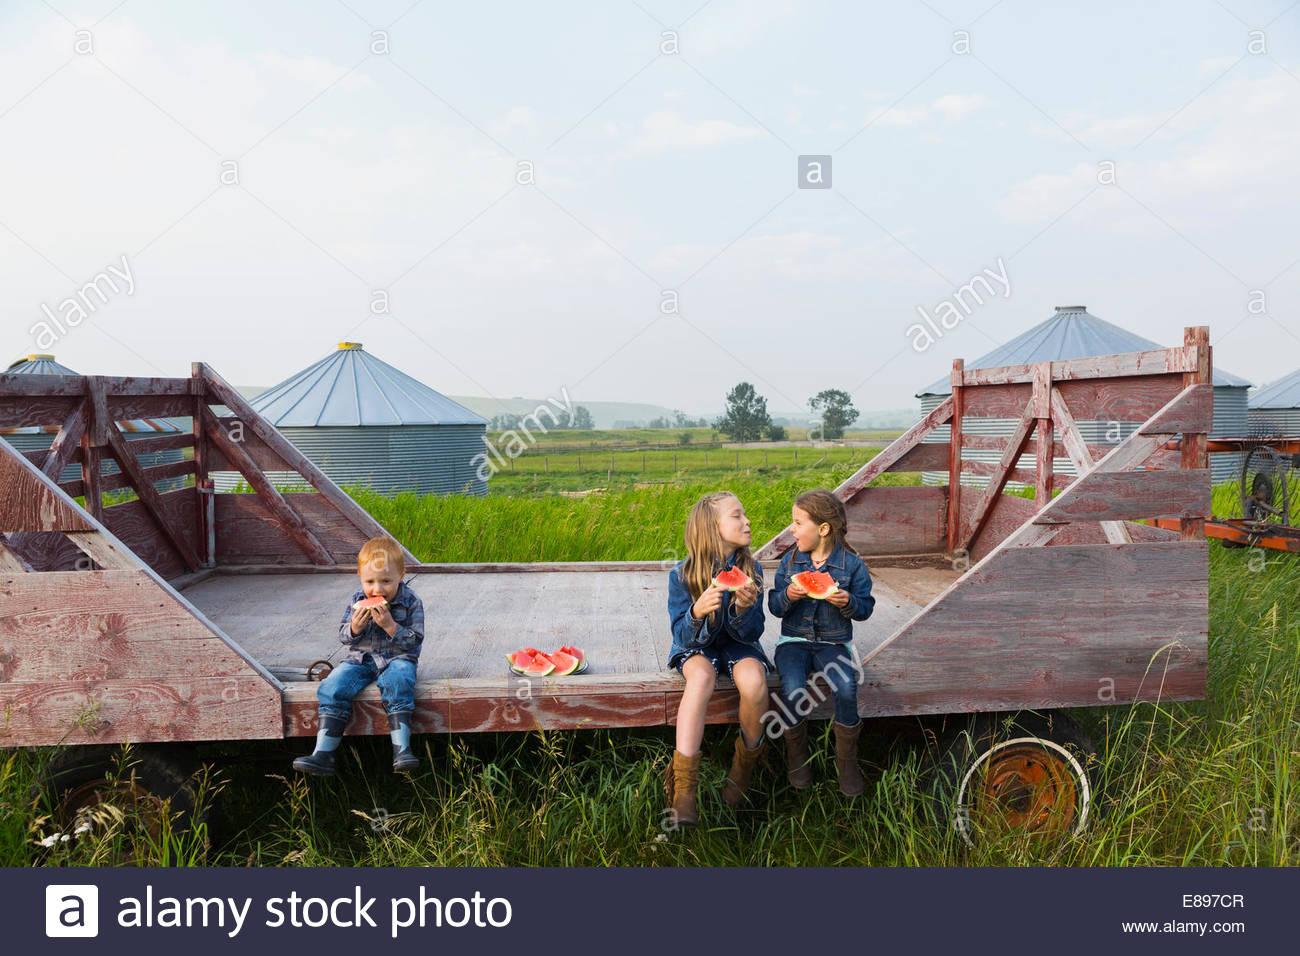 Le ragazze e i ragazzi mangiare anguria in agriturismo Immagini Stock